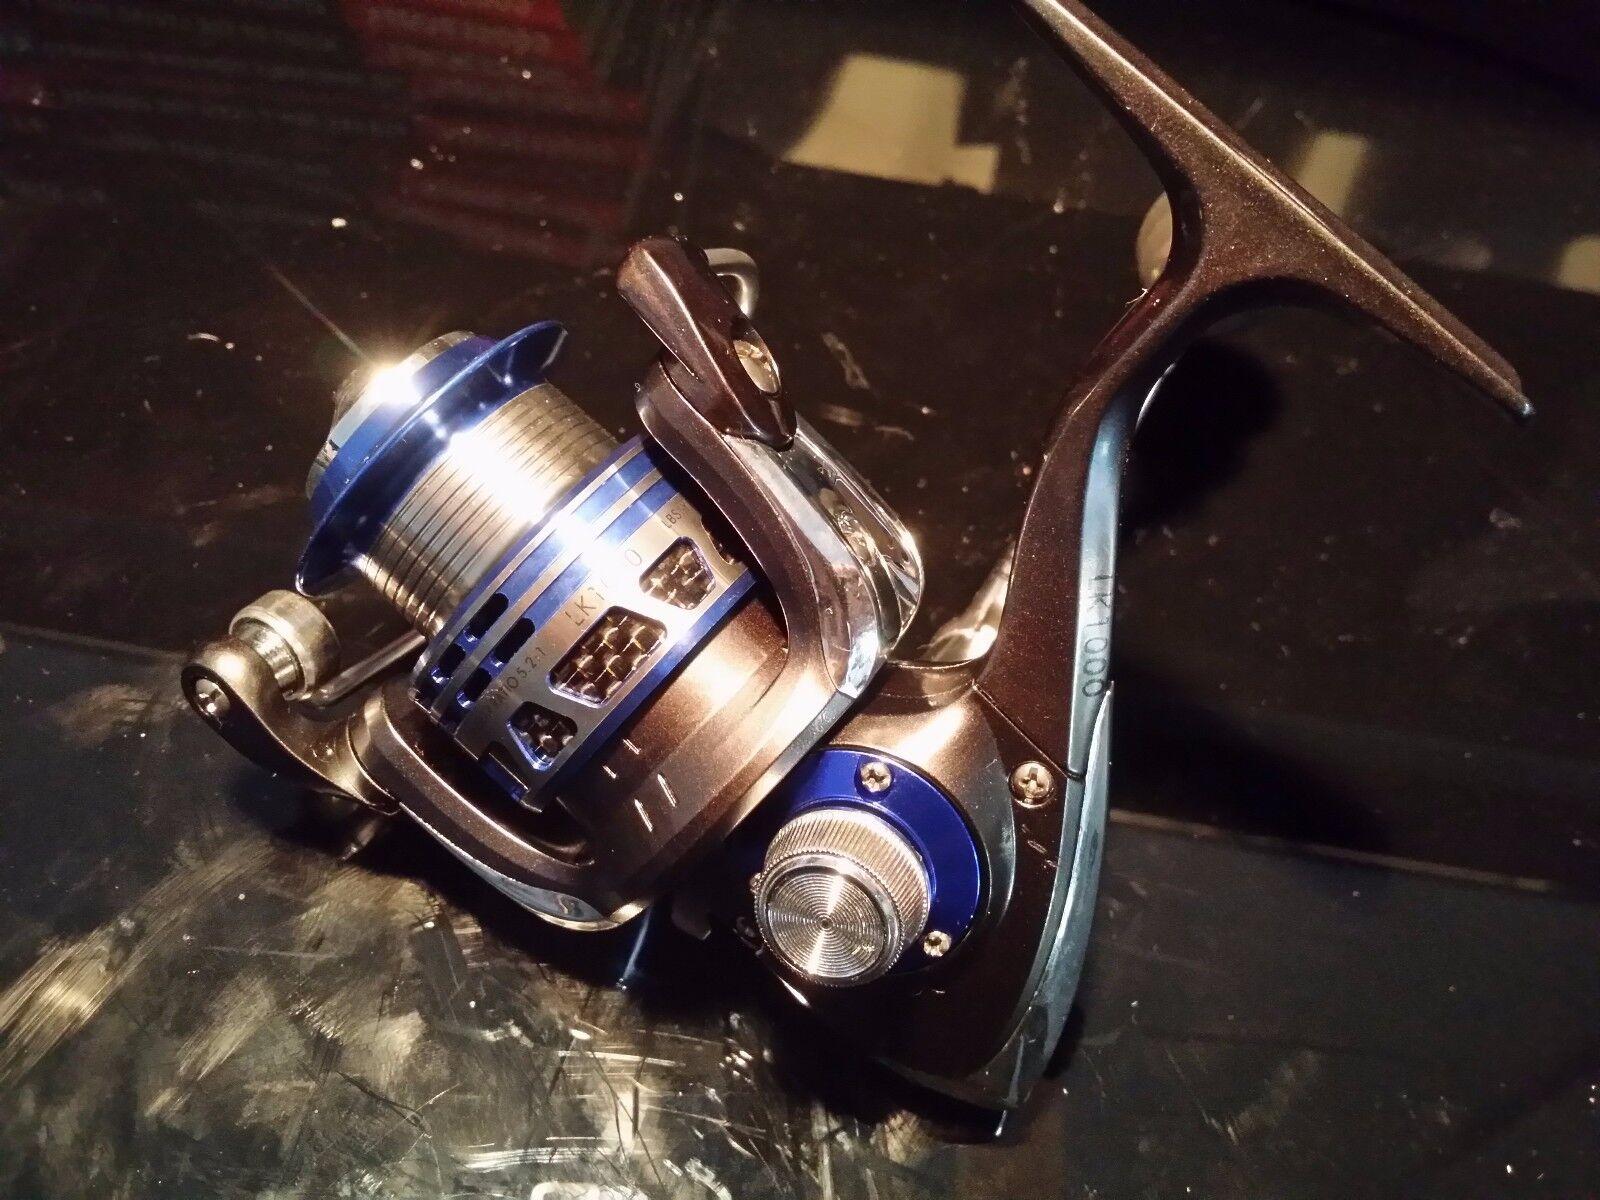 Brand new castorm LA1000 Spinning fishing Reel Metal Frame 6 + 1 BBs